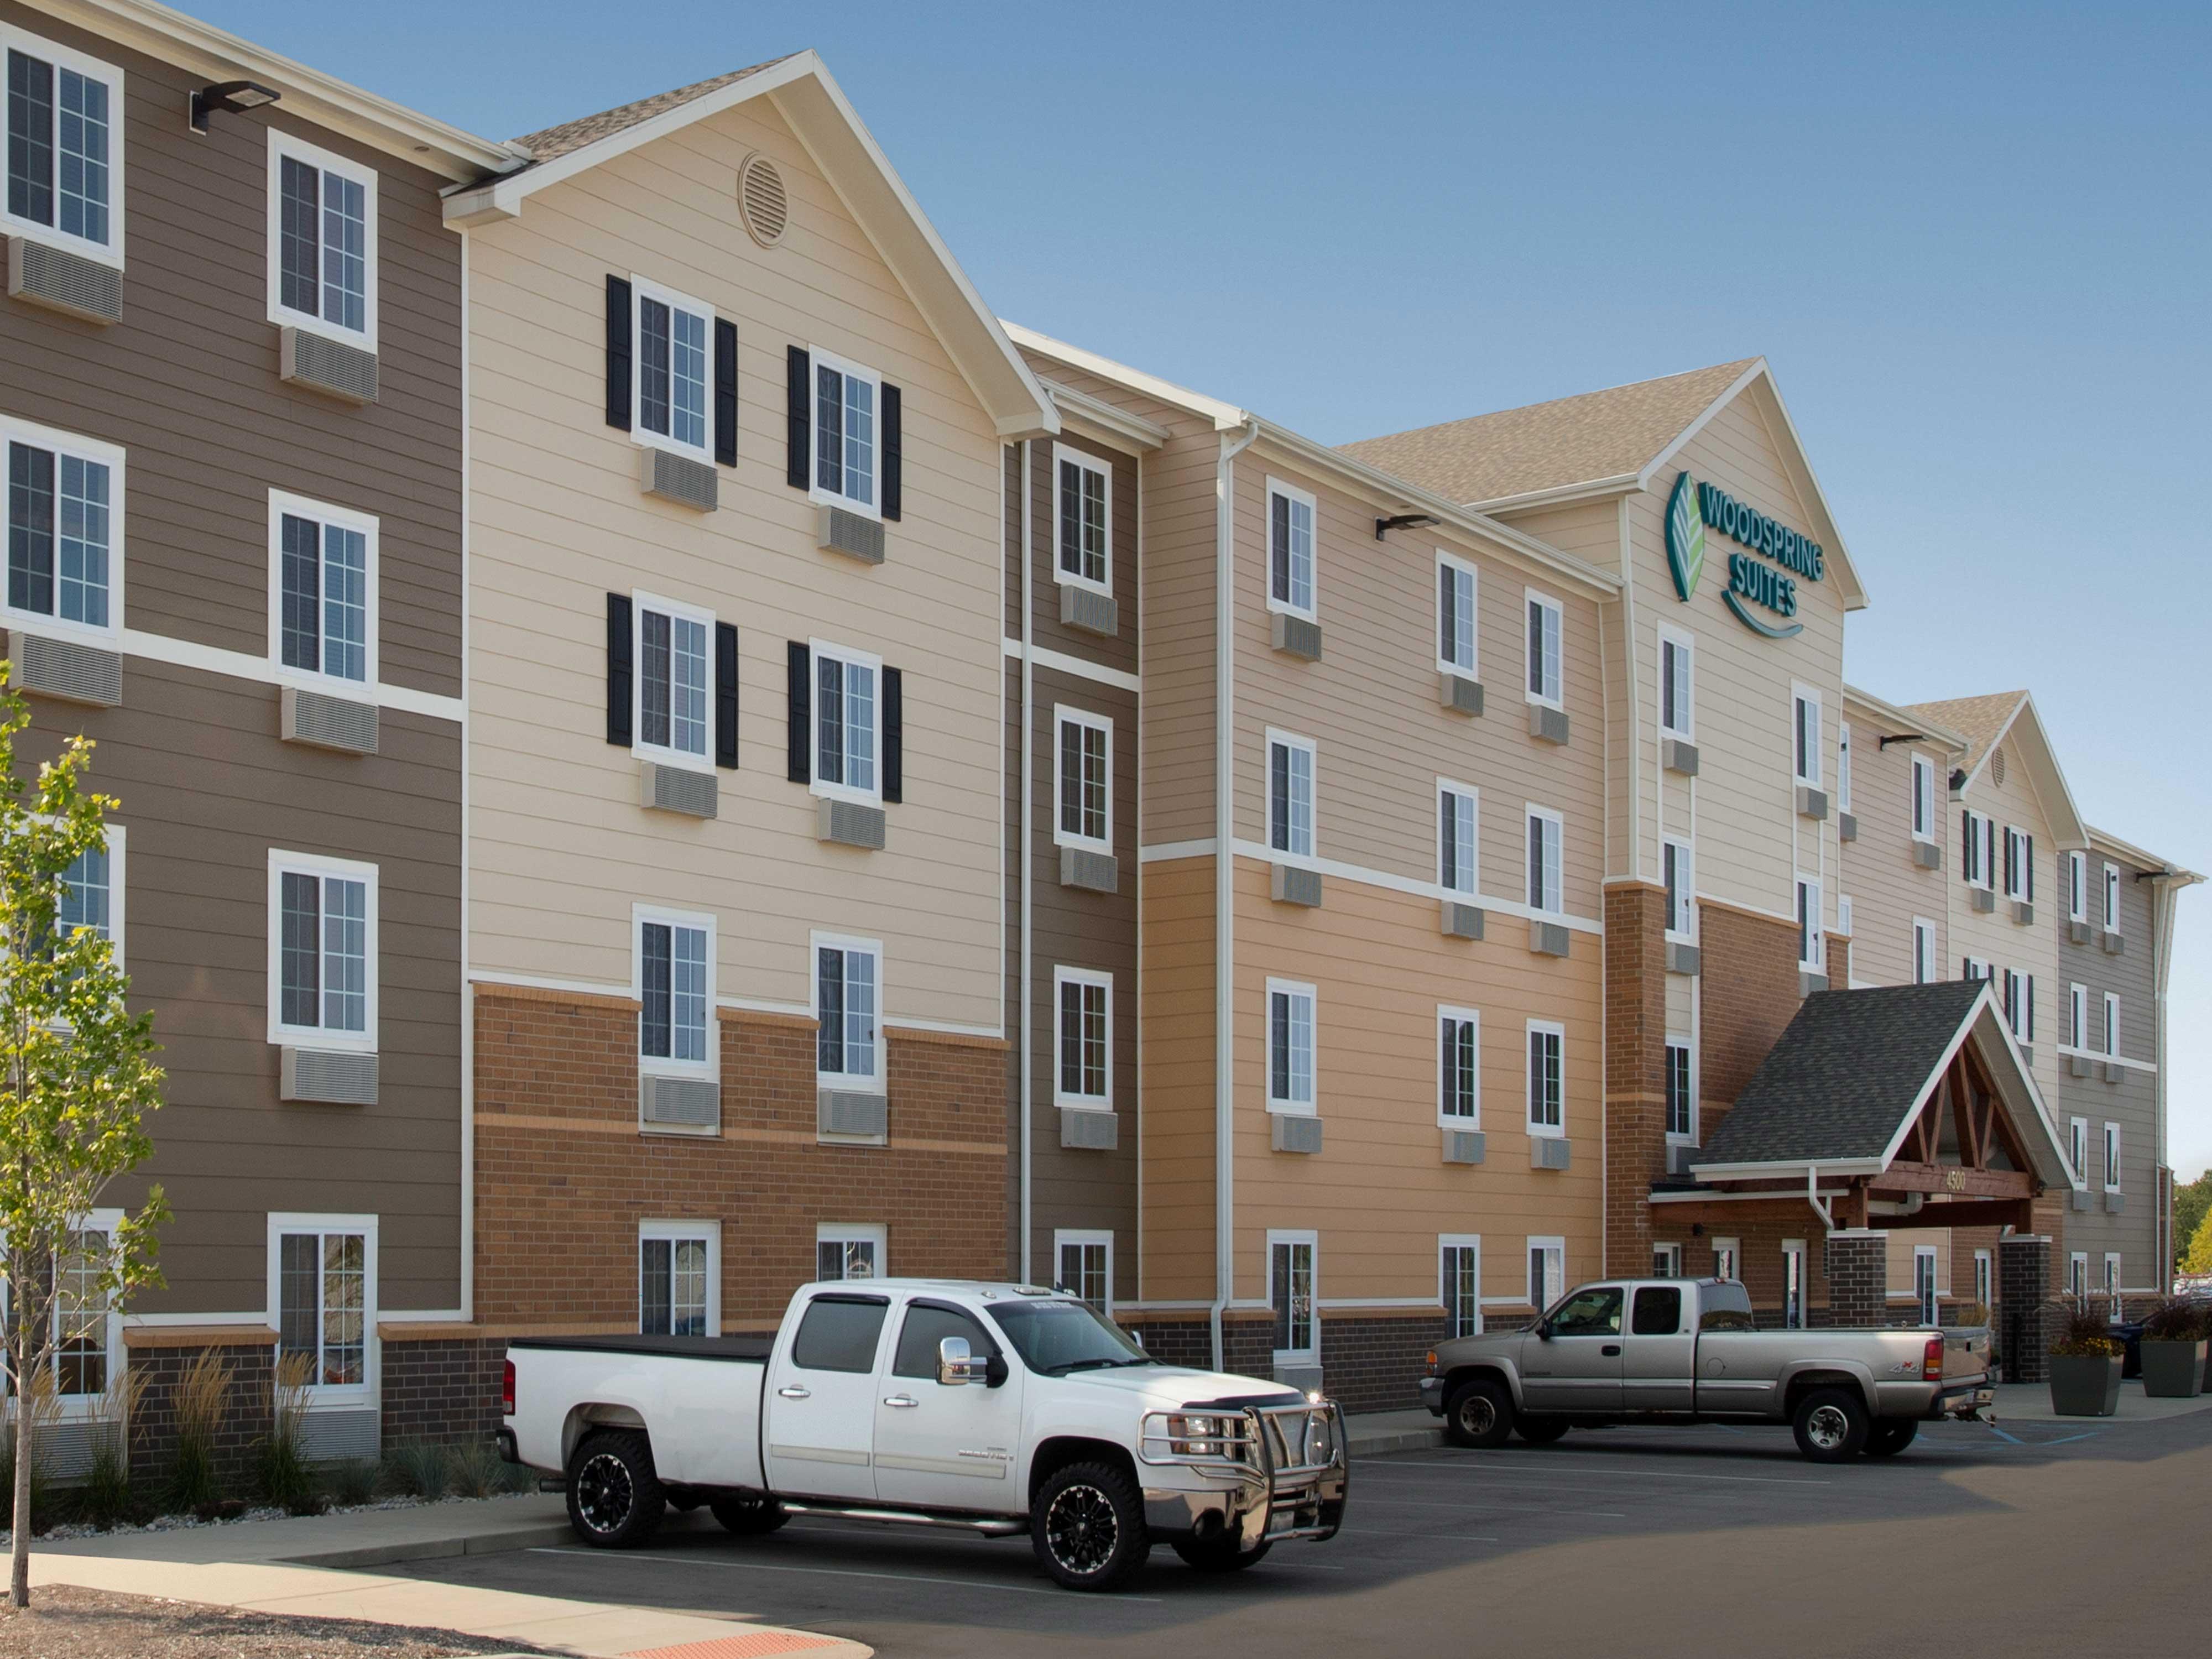 WoodSpring Suites Grand Rapids South image 20